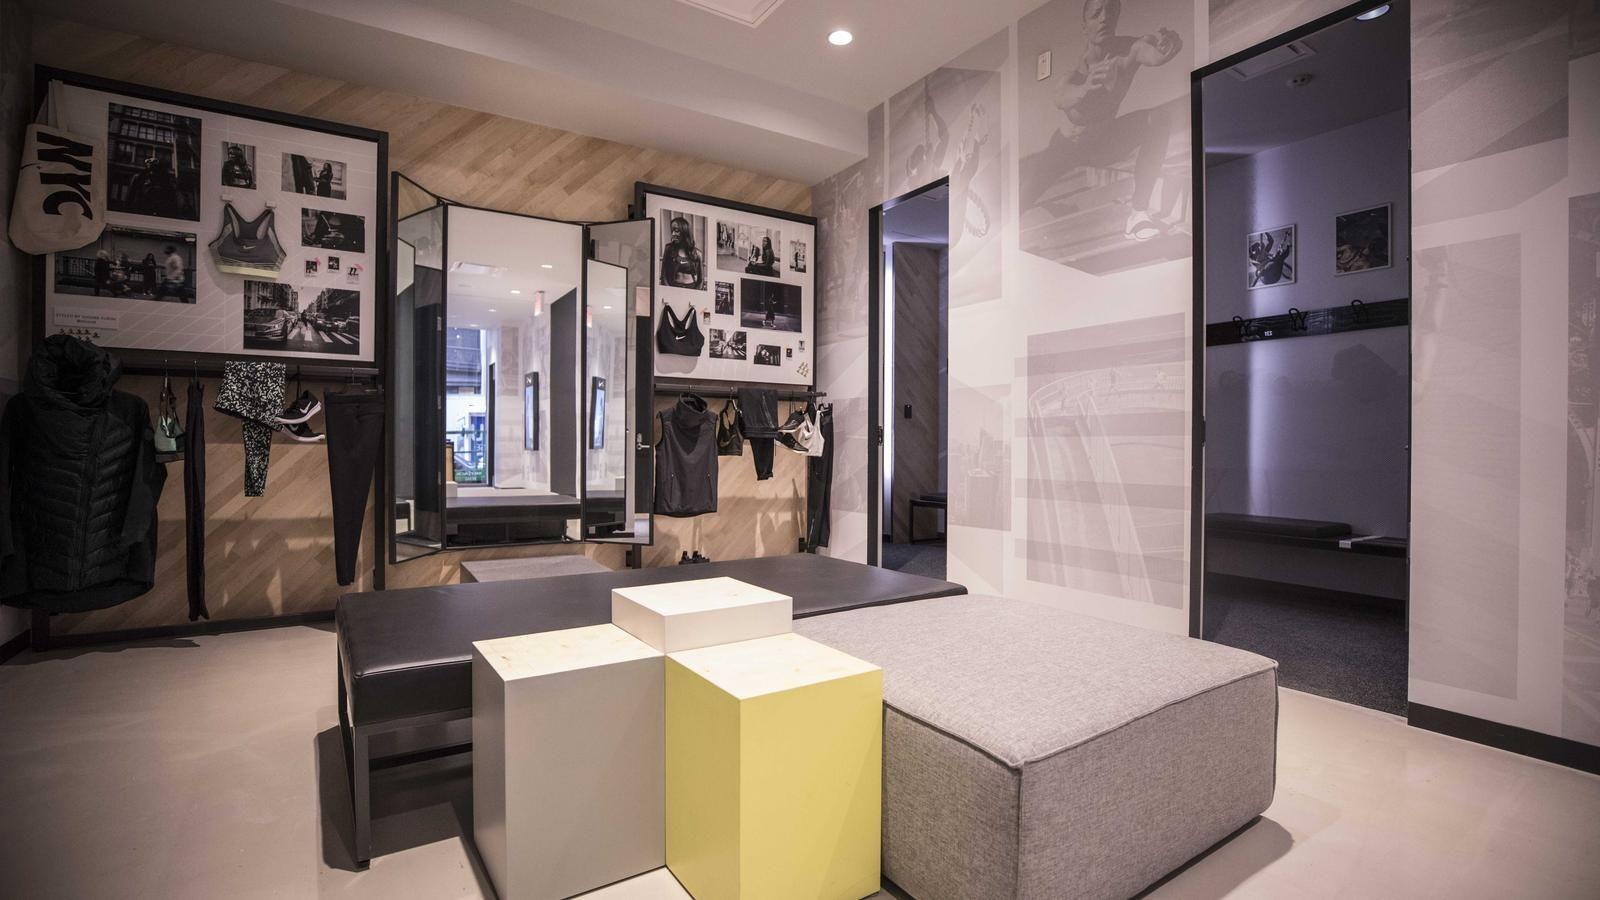 rutina leyendo agradable  First Look: Inside Nike Soho | Store interiors, Shop interior design,  Interior